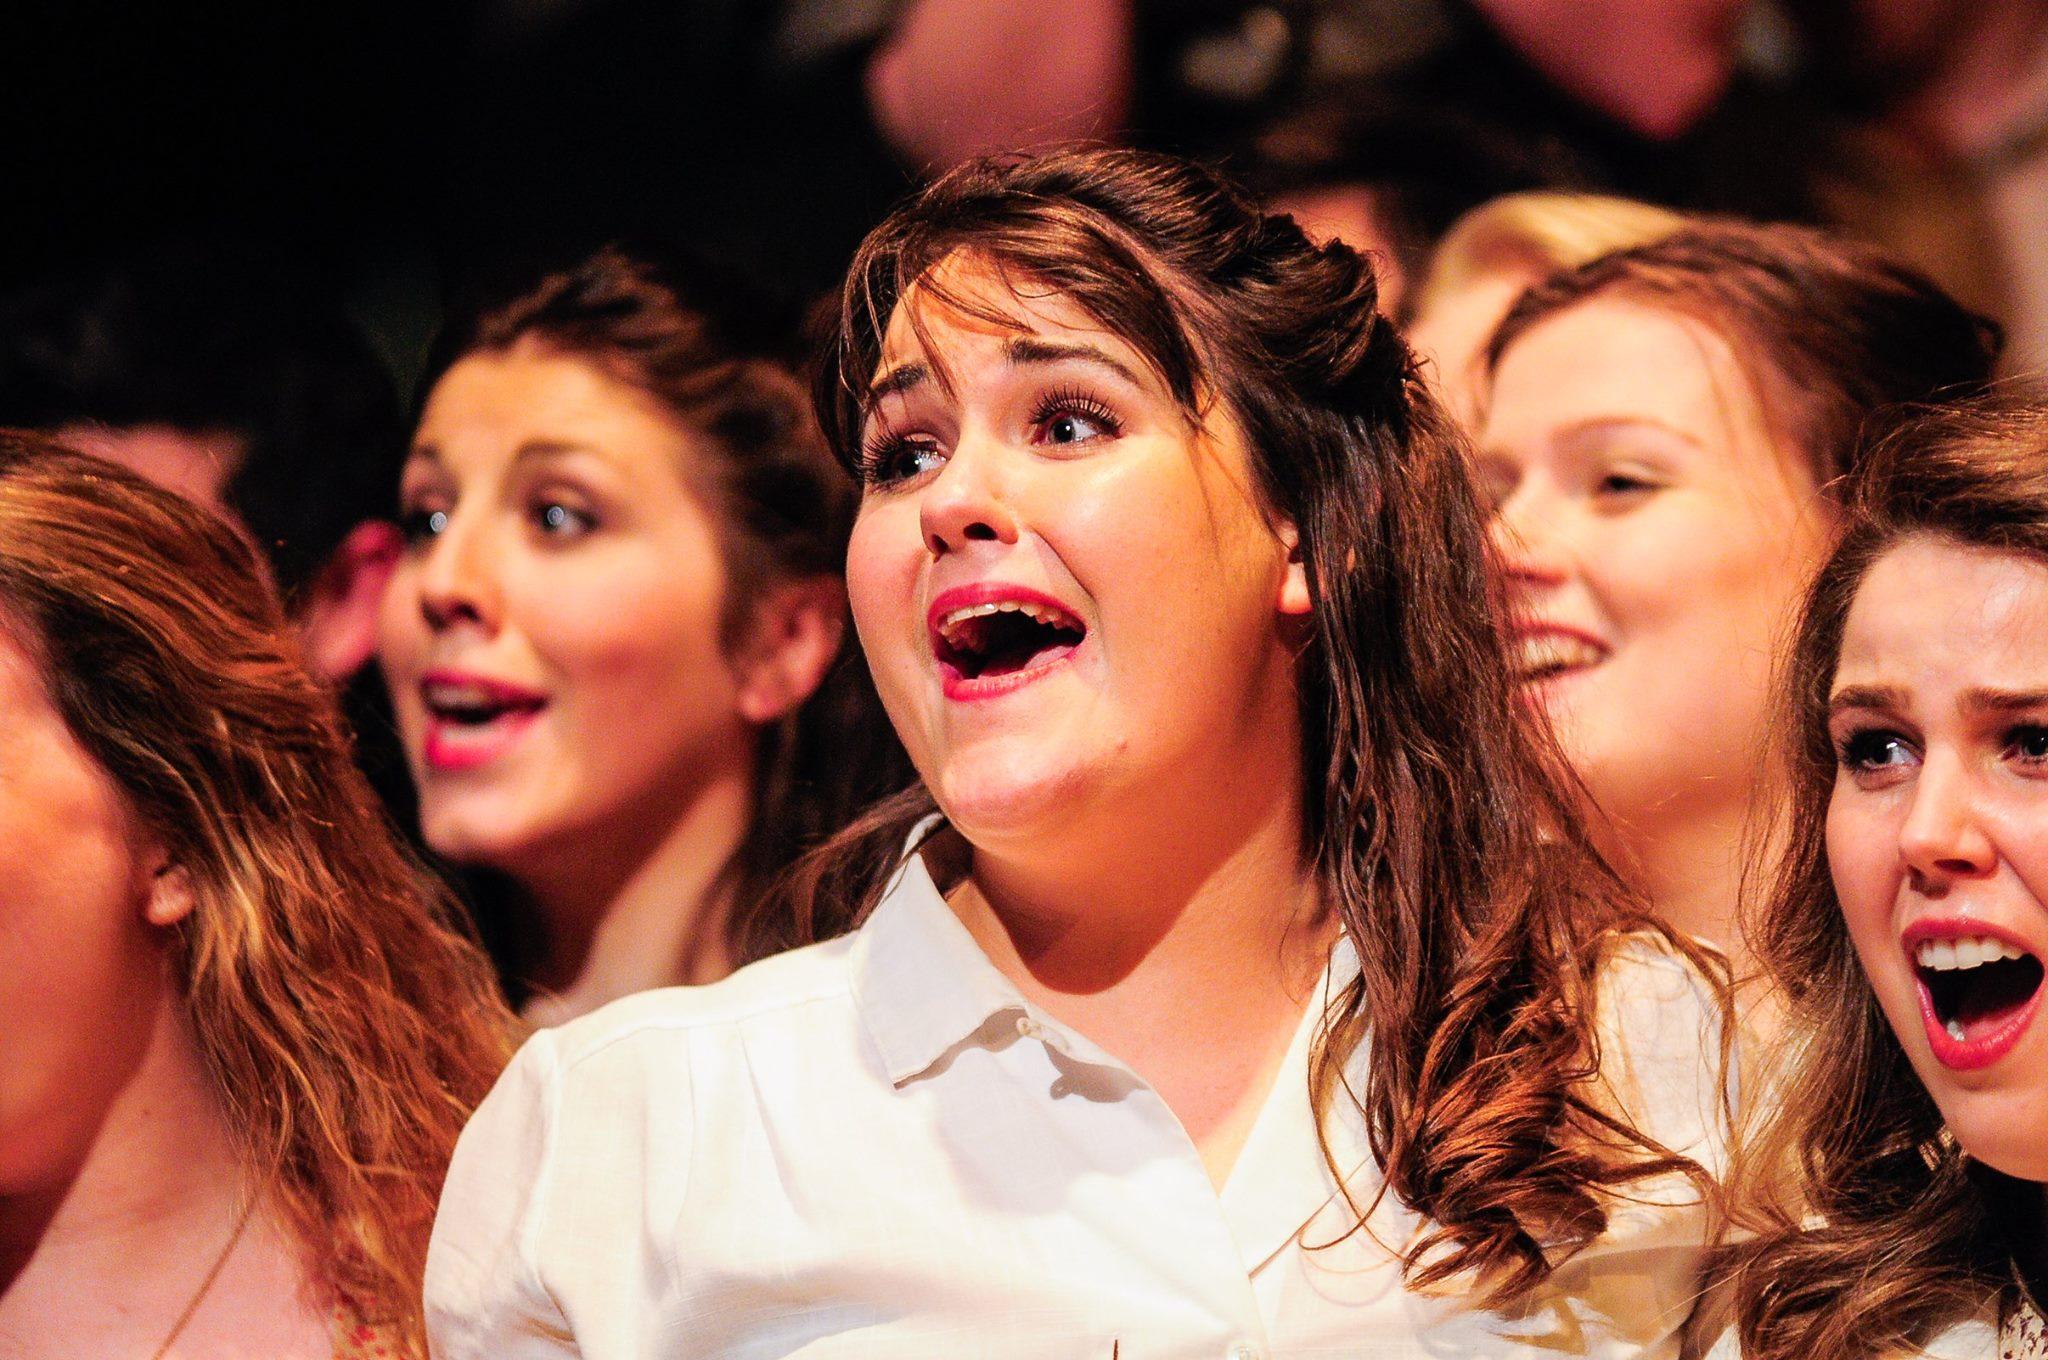 Carmen (Opera'r Ddraig, 2014). Photos by Kirsten McTernan.